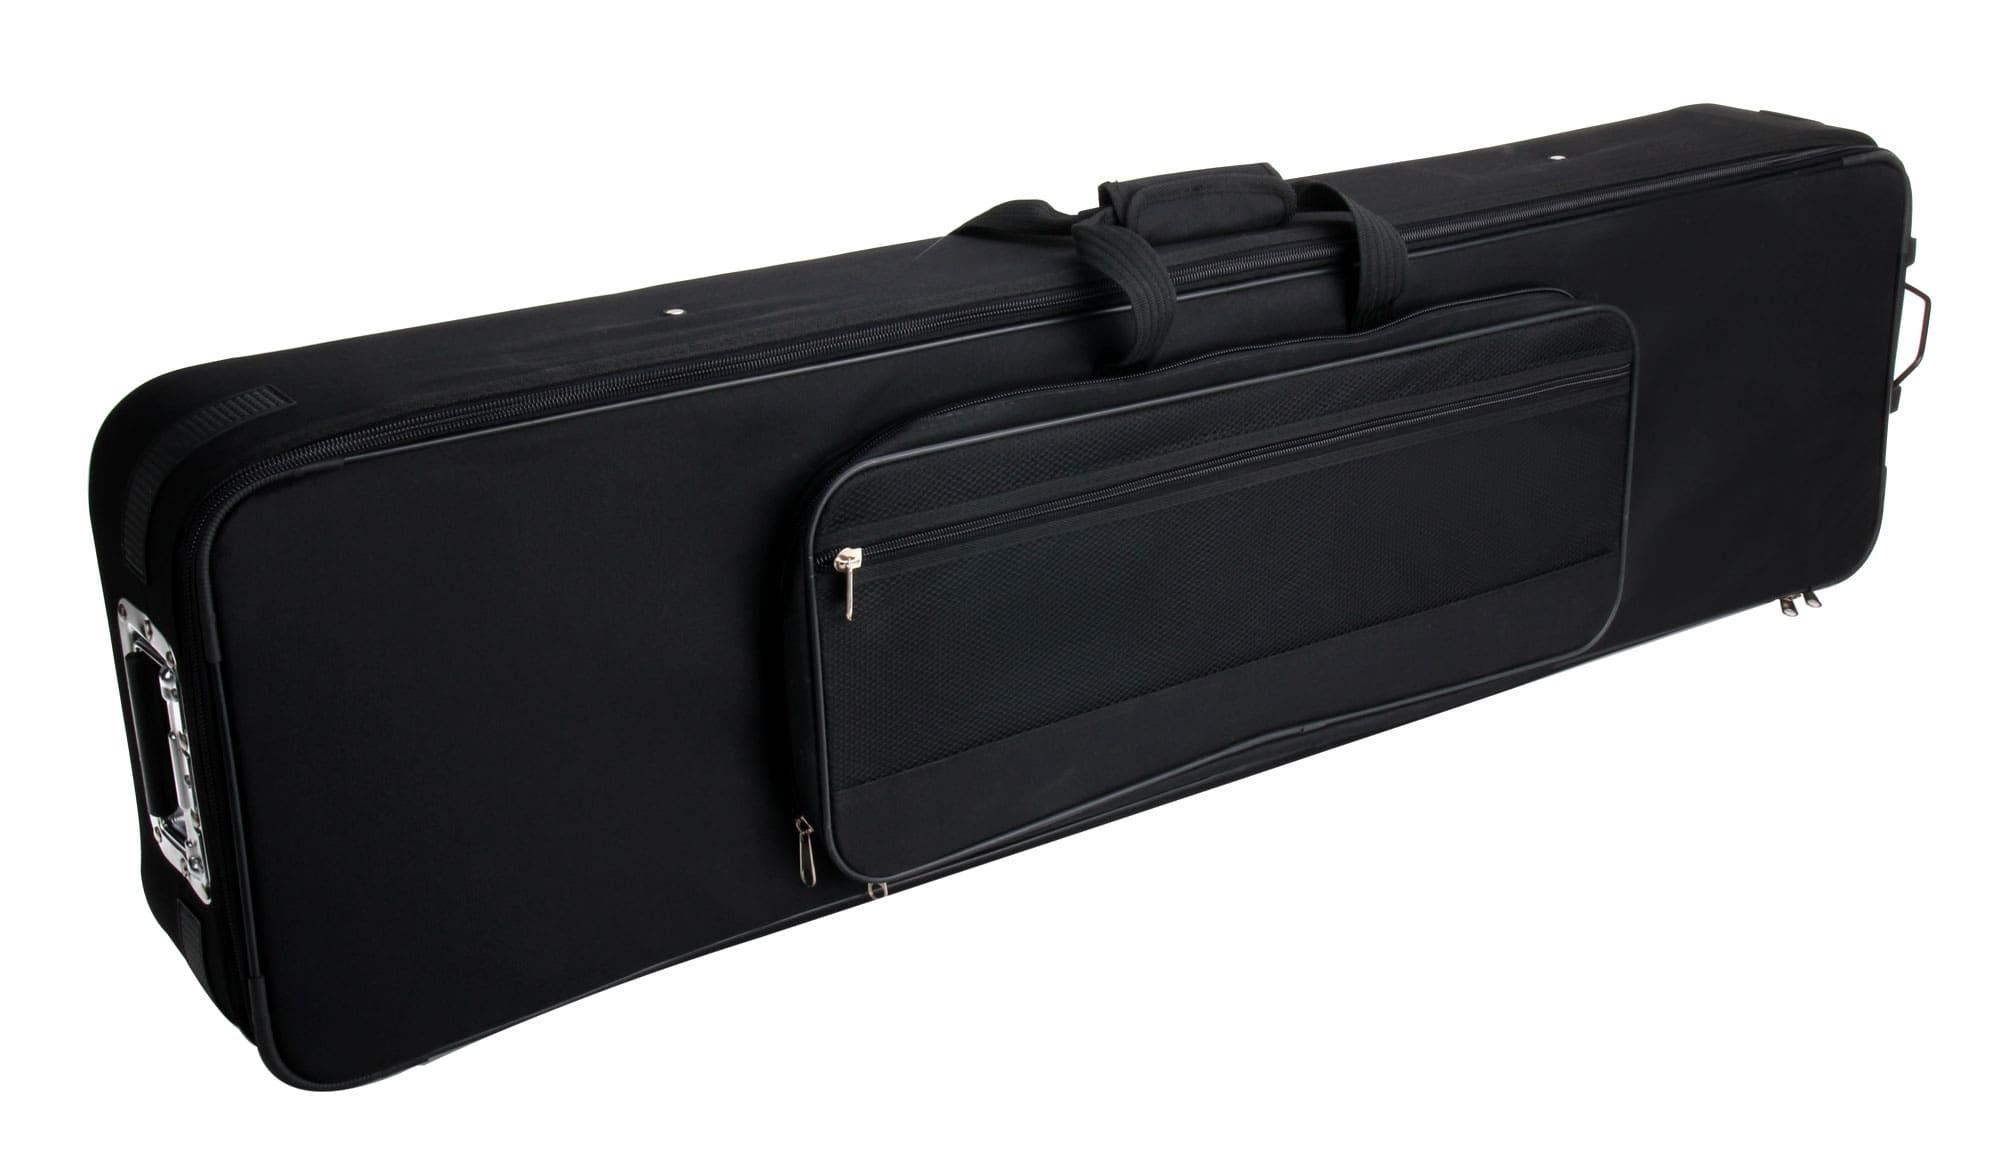 Zubehoerkeyboards - Classic Cantabile KHT 135 Keyboard Hardtrolley - Onlineshop Musikhaus Kirstein